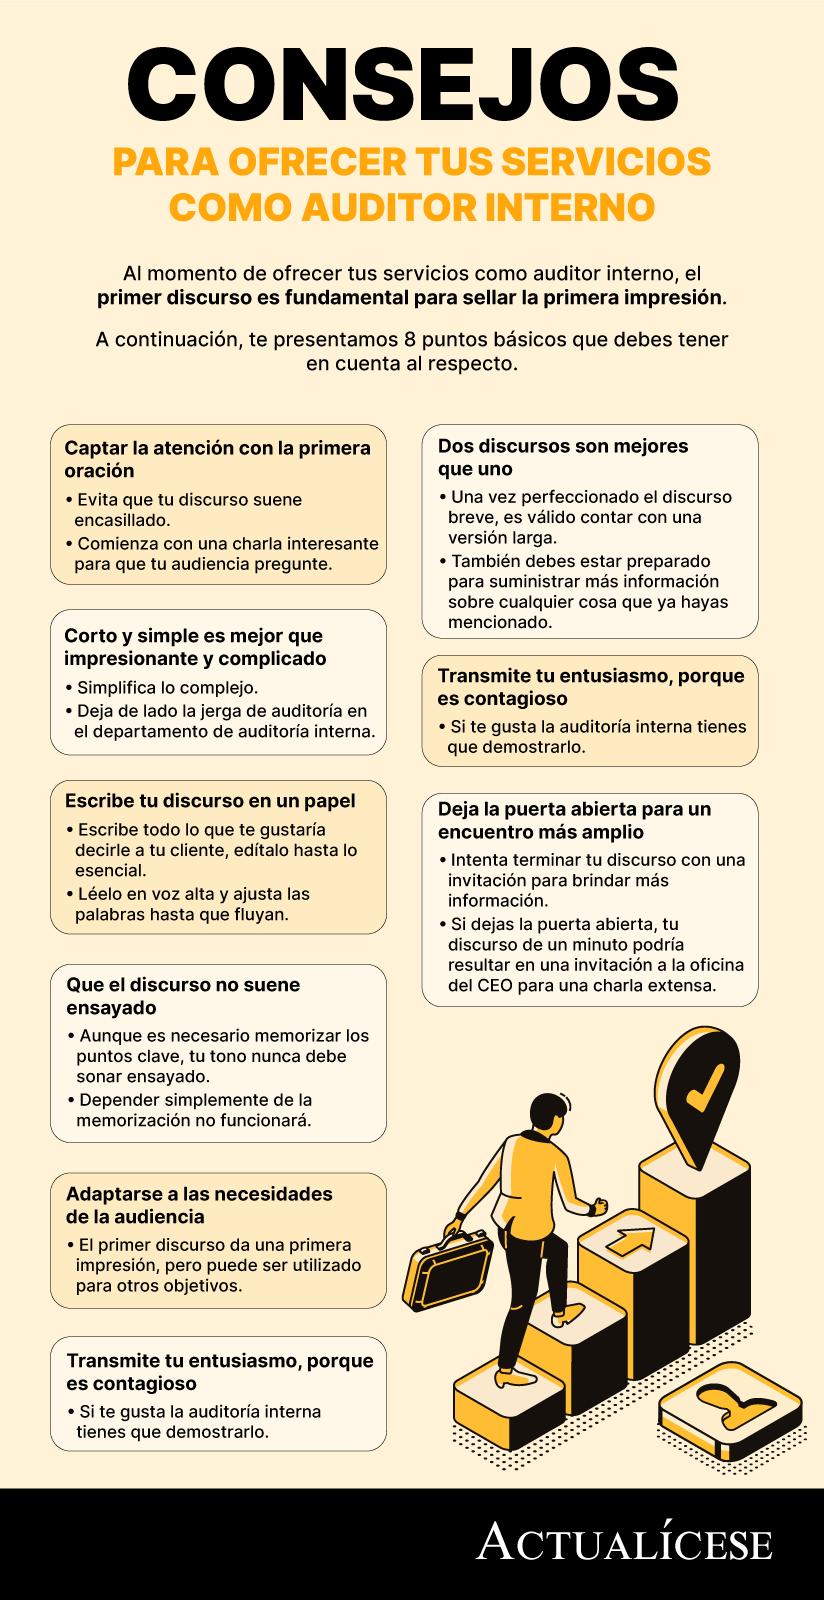 [Infografía] Consejos para ofrecer tus servicios como auditor interno